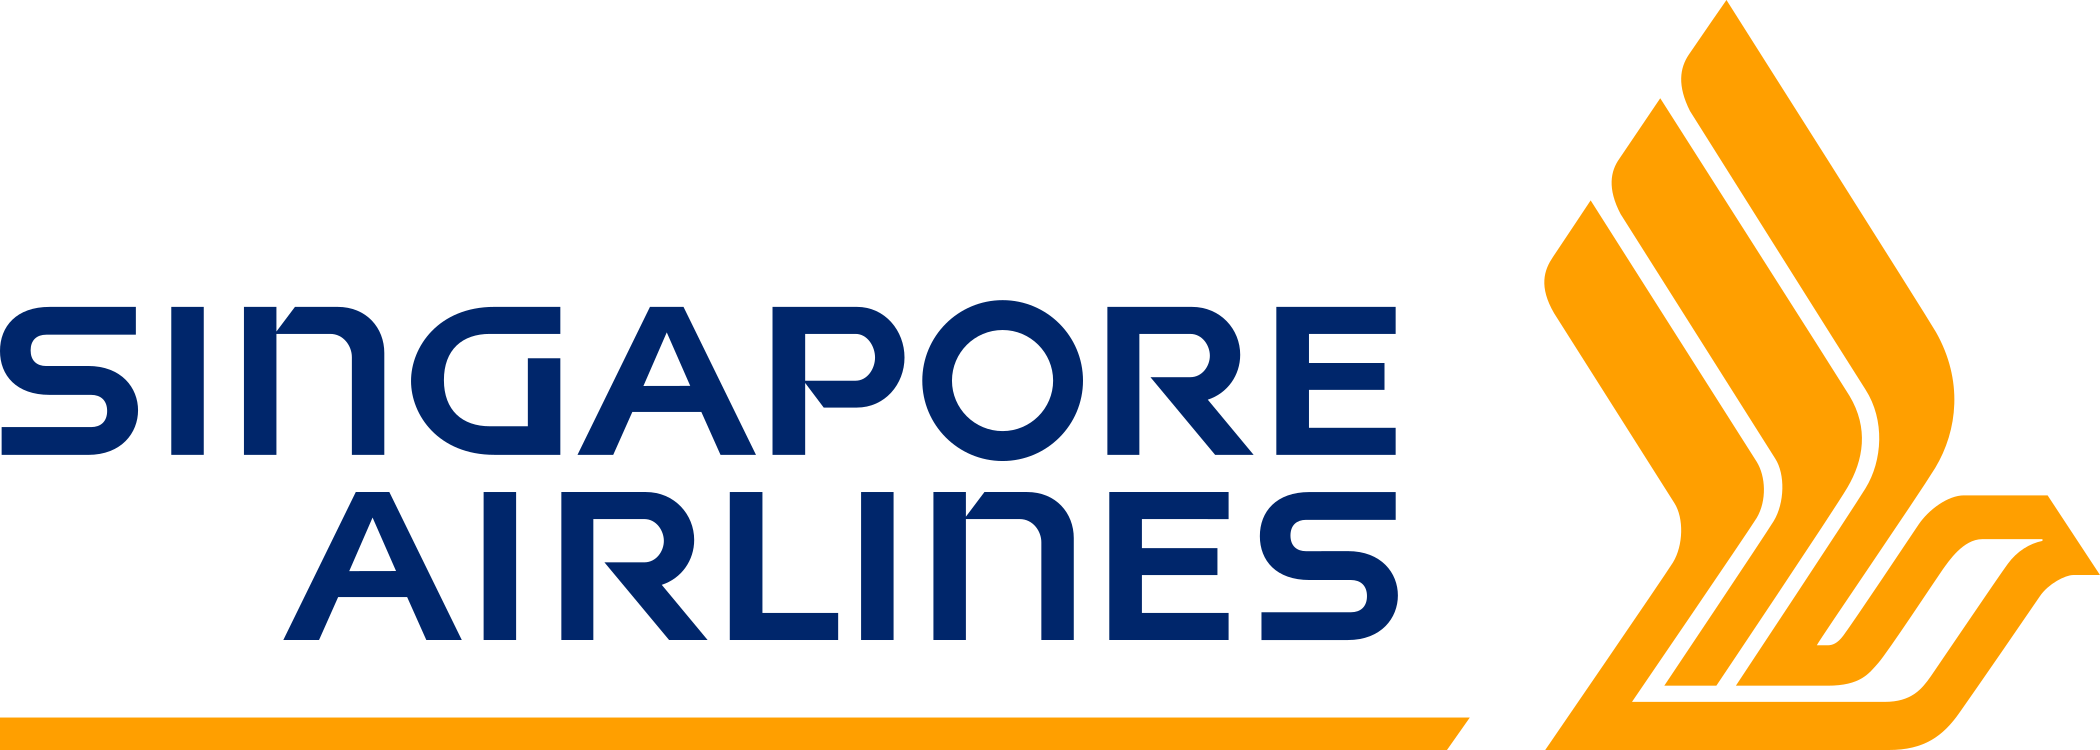 singapore airlines logo 2 - Singapore Airlines Logo